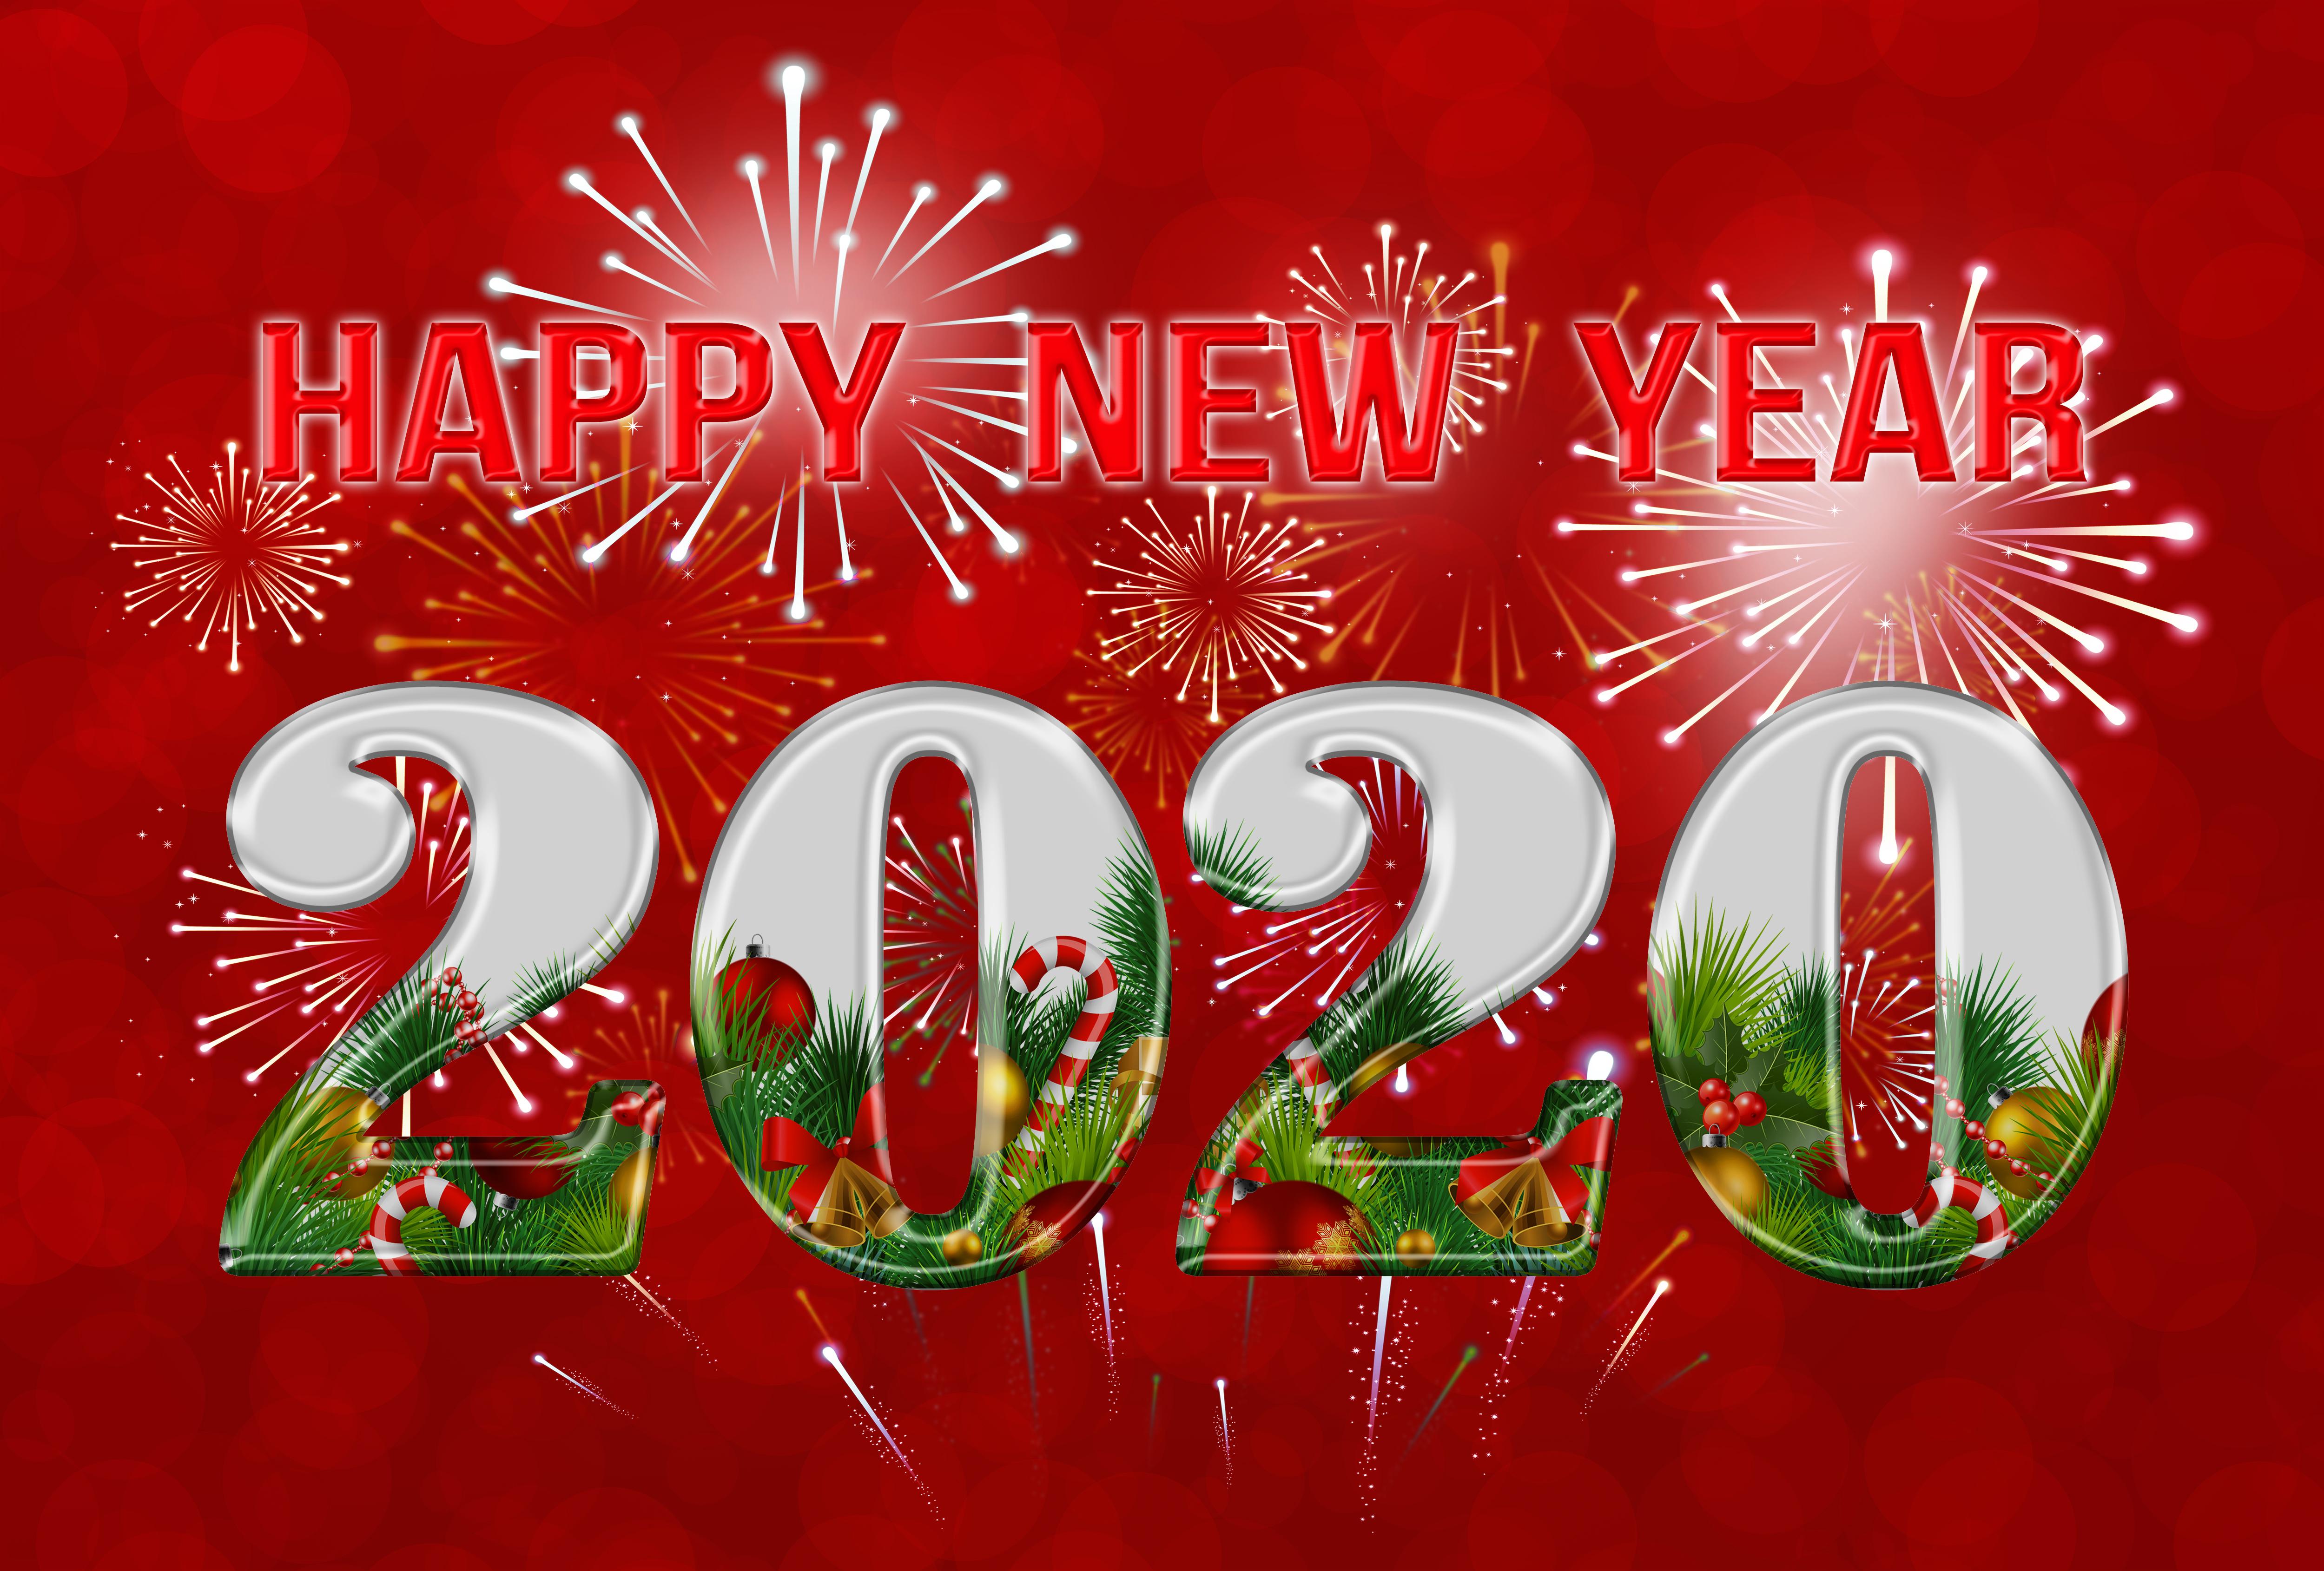 New Year 2020 4k Ultra HD Wallpaper Background Image 5000x3381 5000x3381